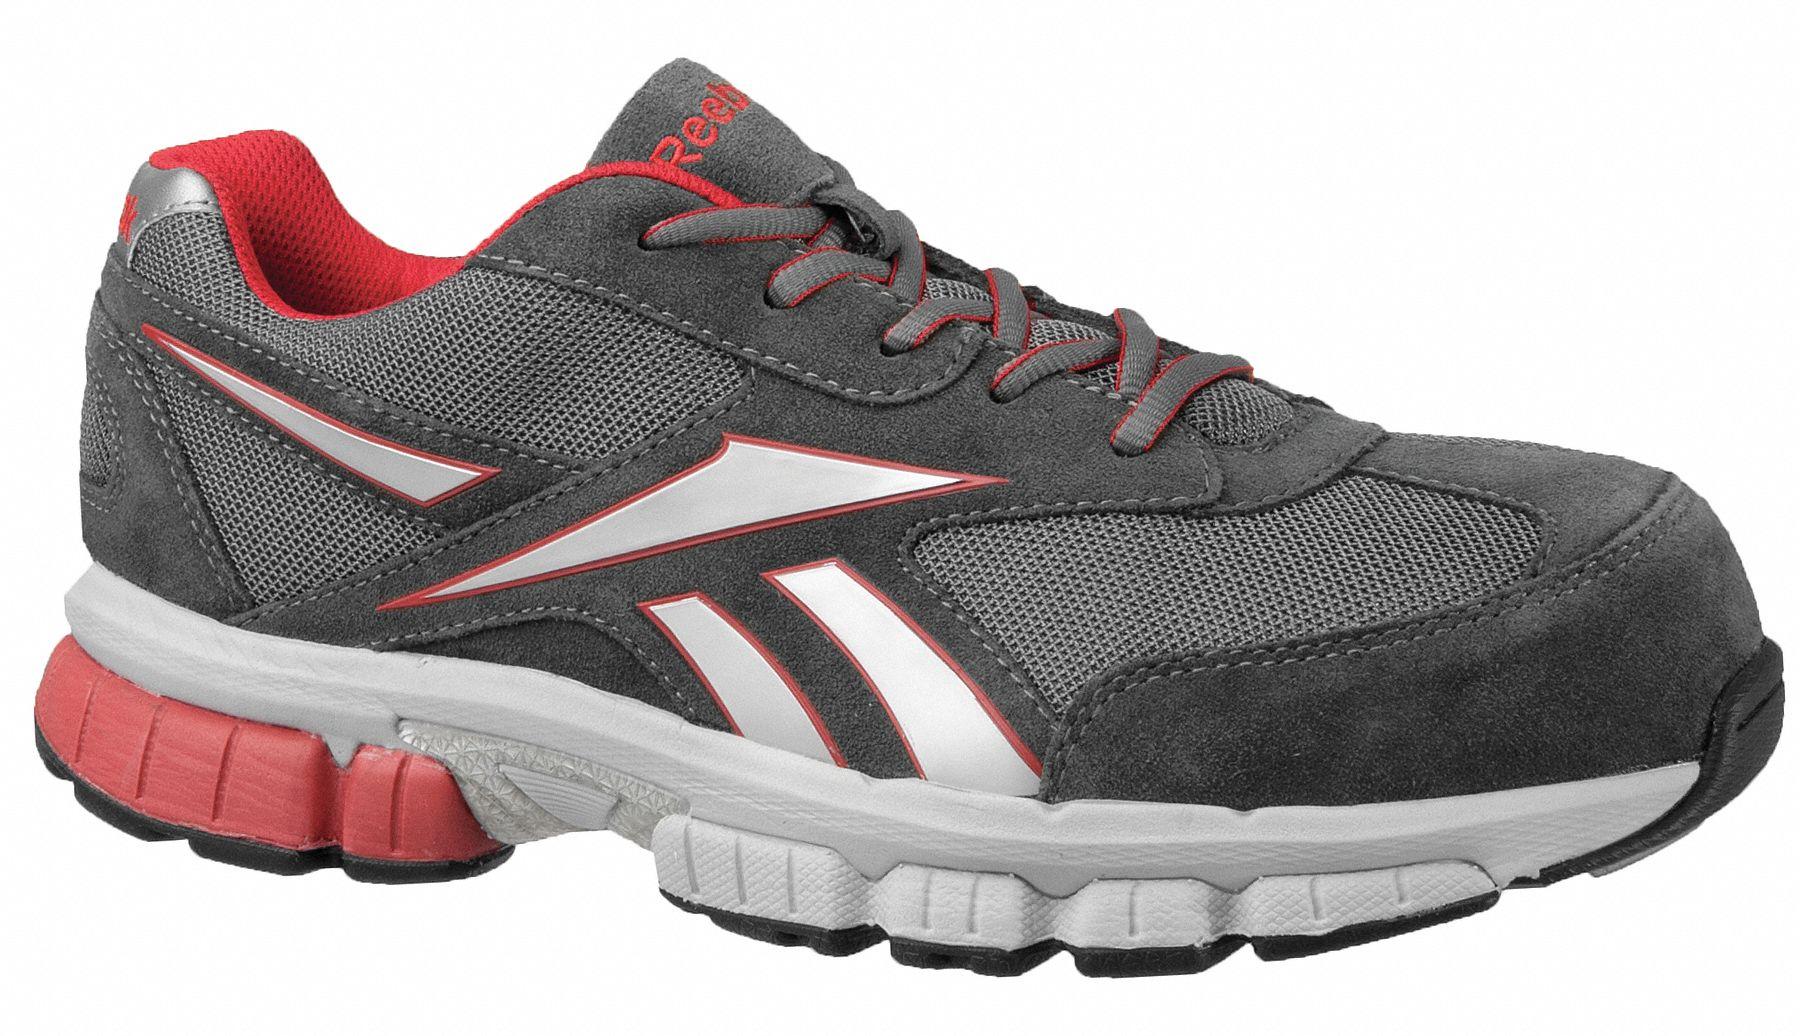 REEBOK Men s Athletic Work Shoes 8b37adfa9